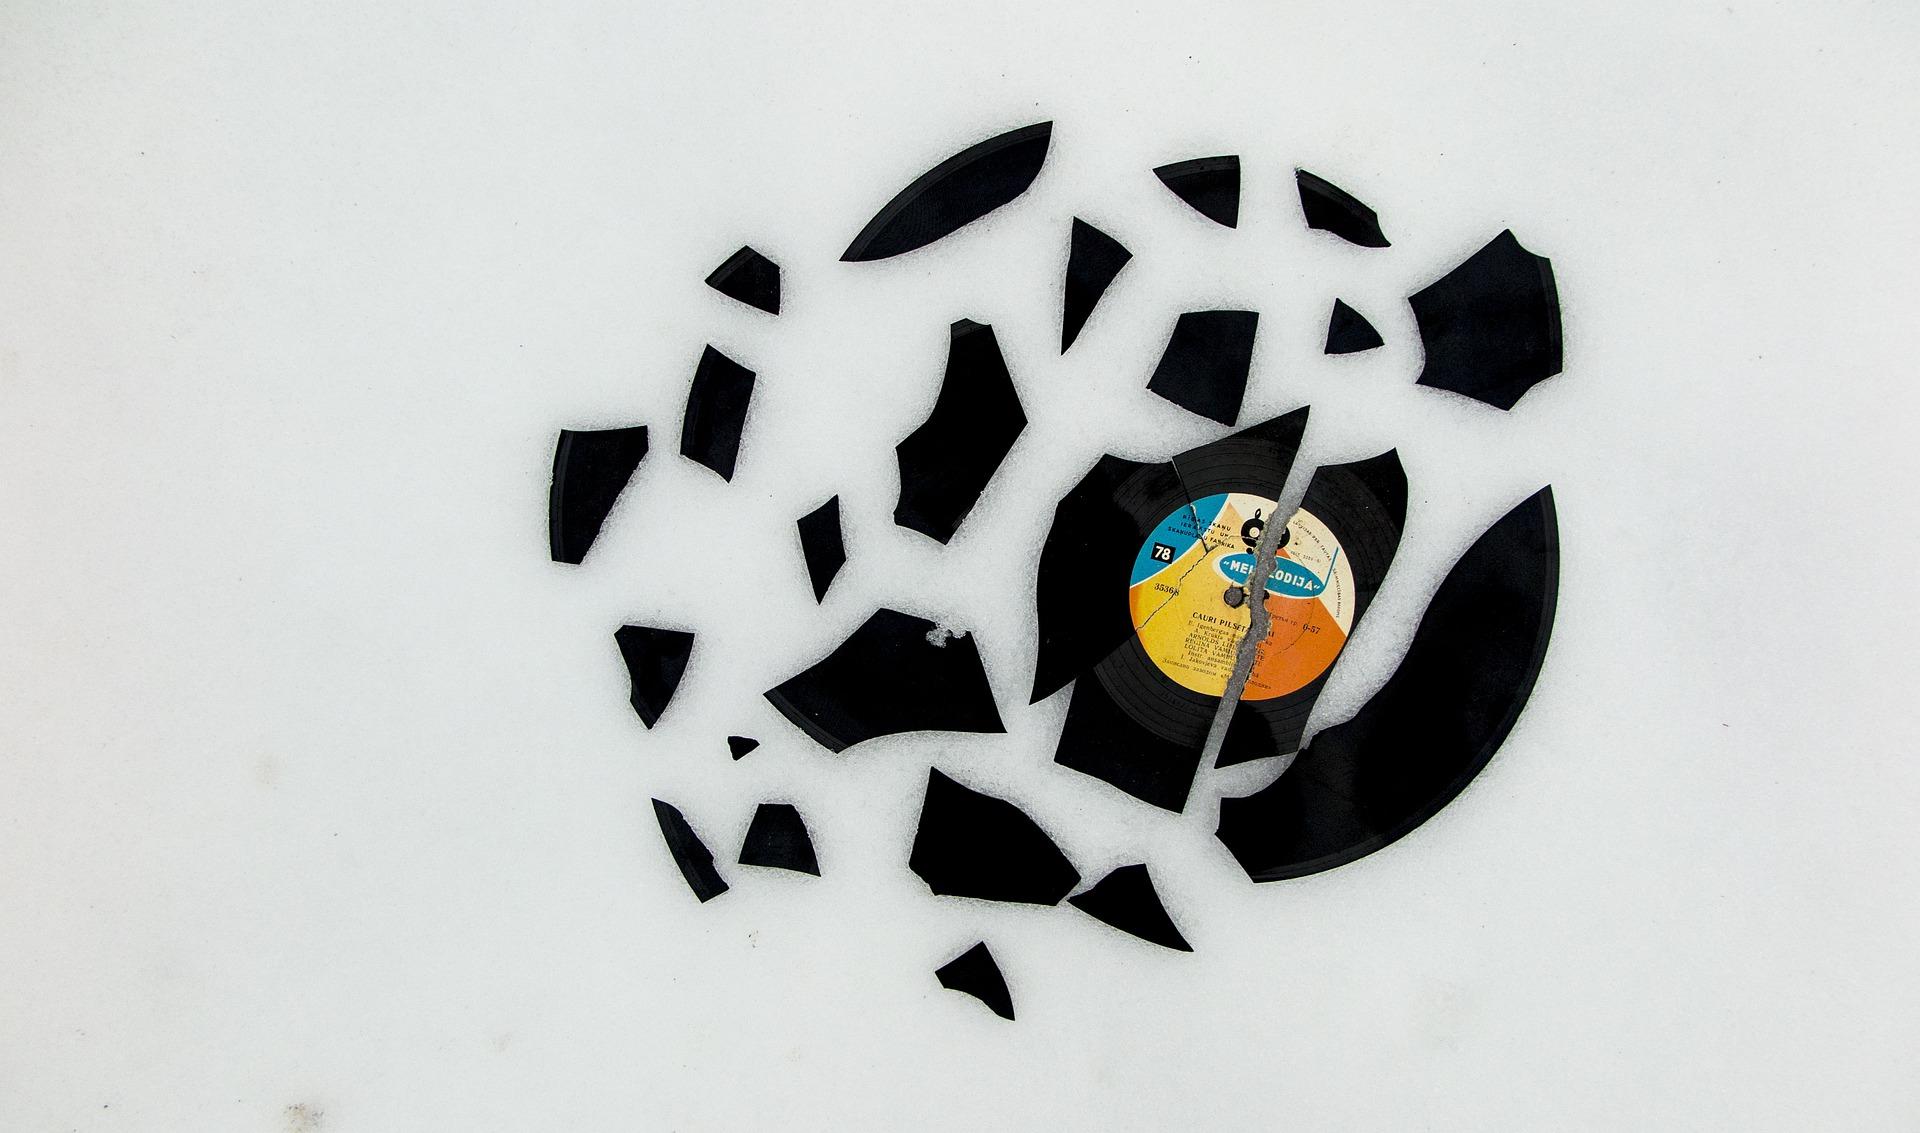 a vinyl record that has been broken into pieces